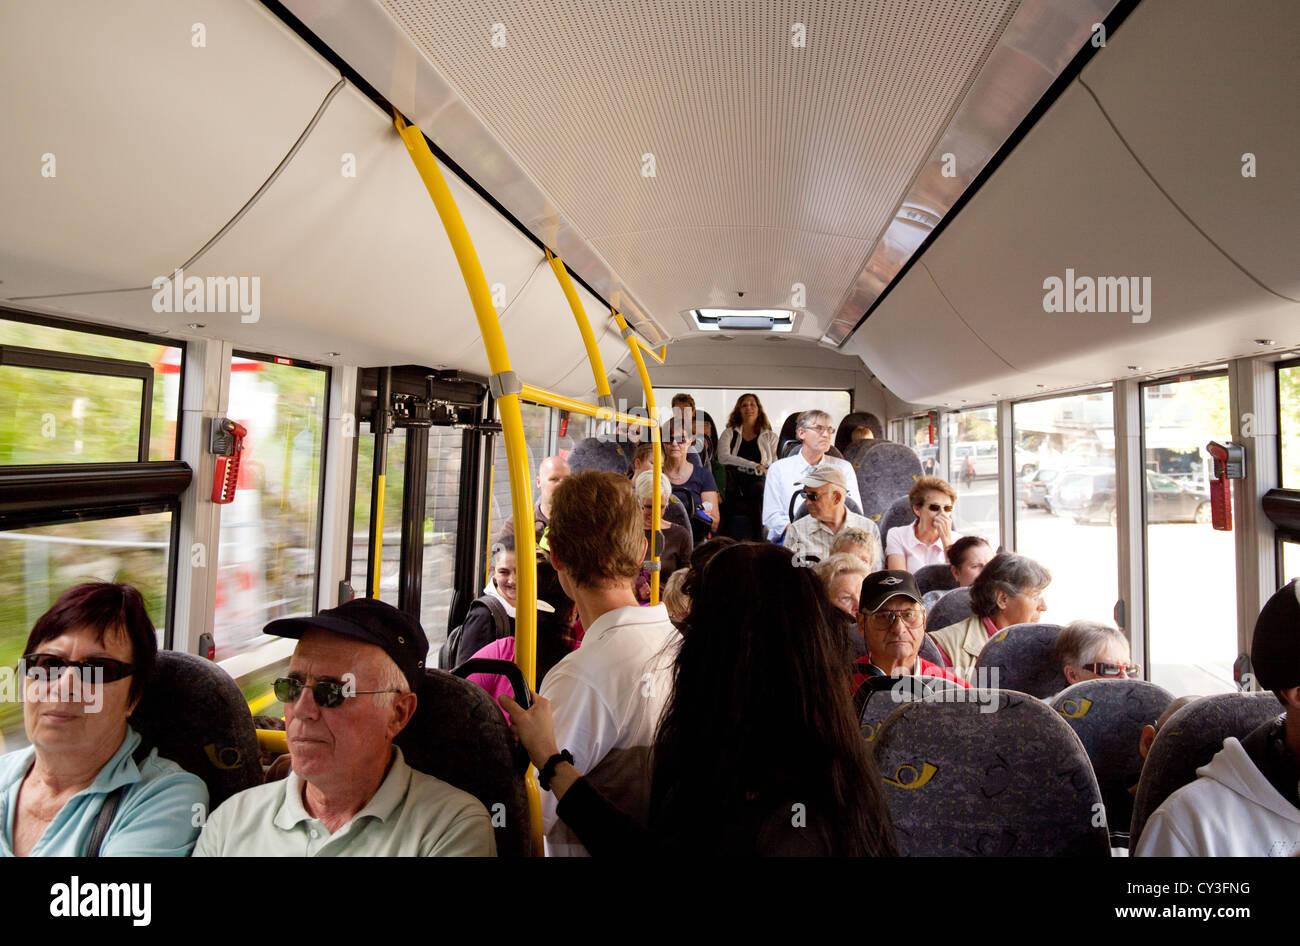 A crowd inside a Swiss public transport bus, Flims, Graubunden, Switzerland Europe - Stock Image